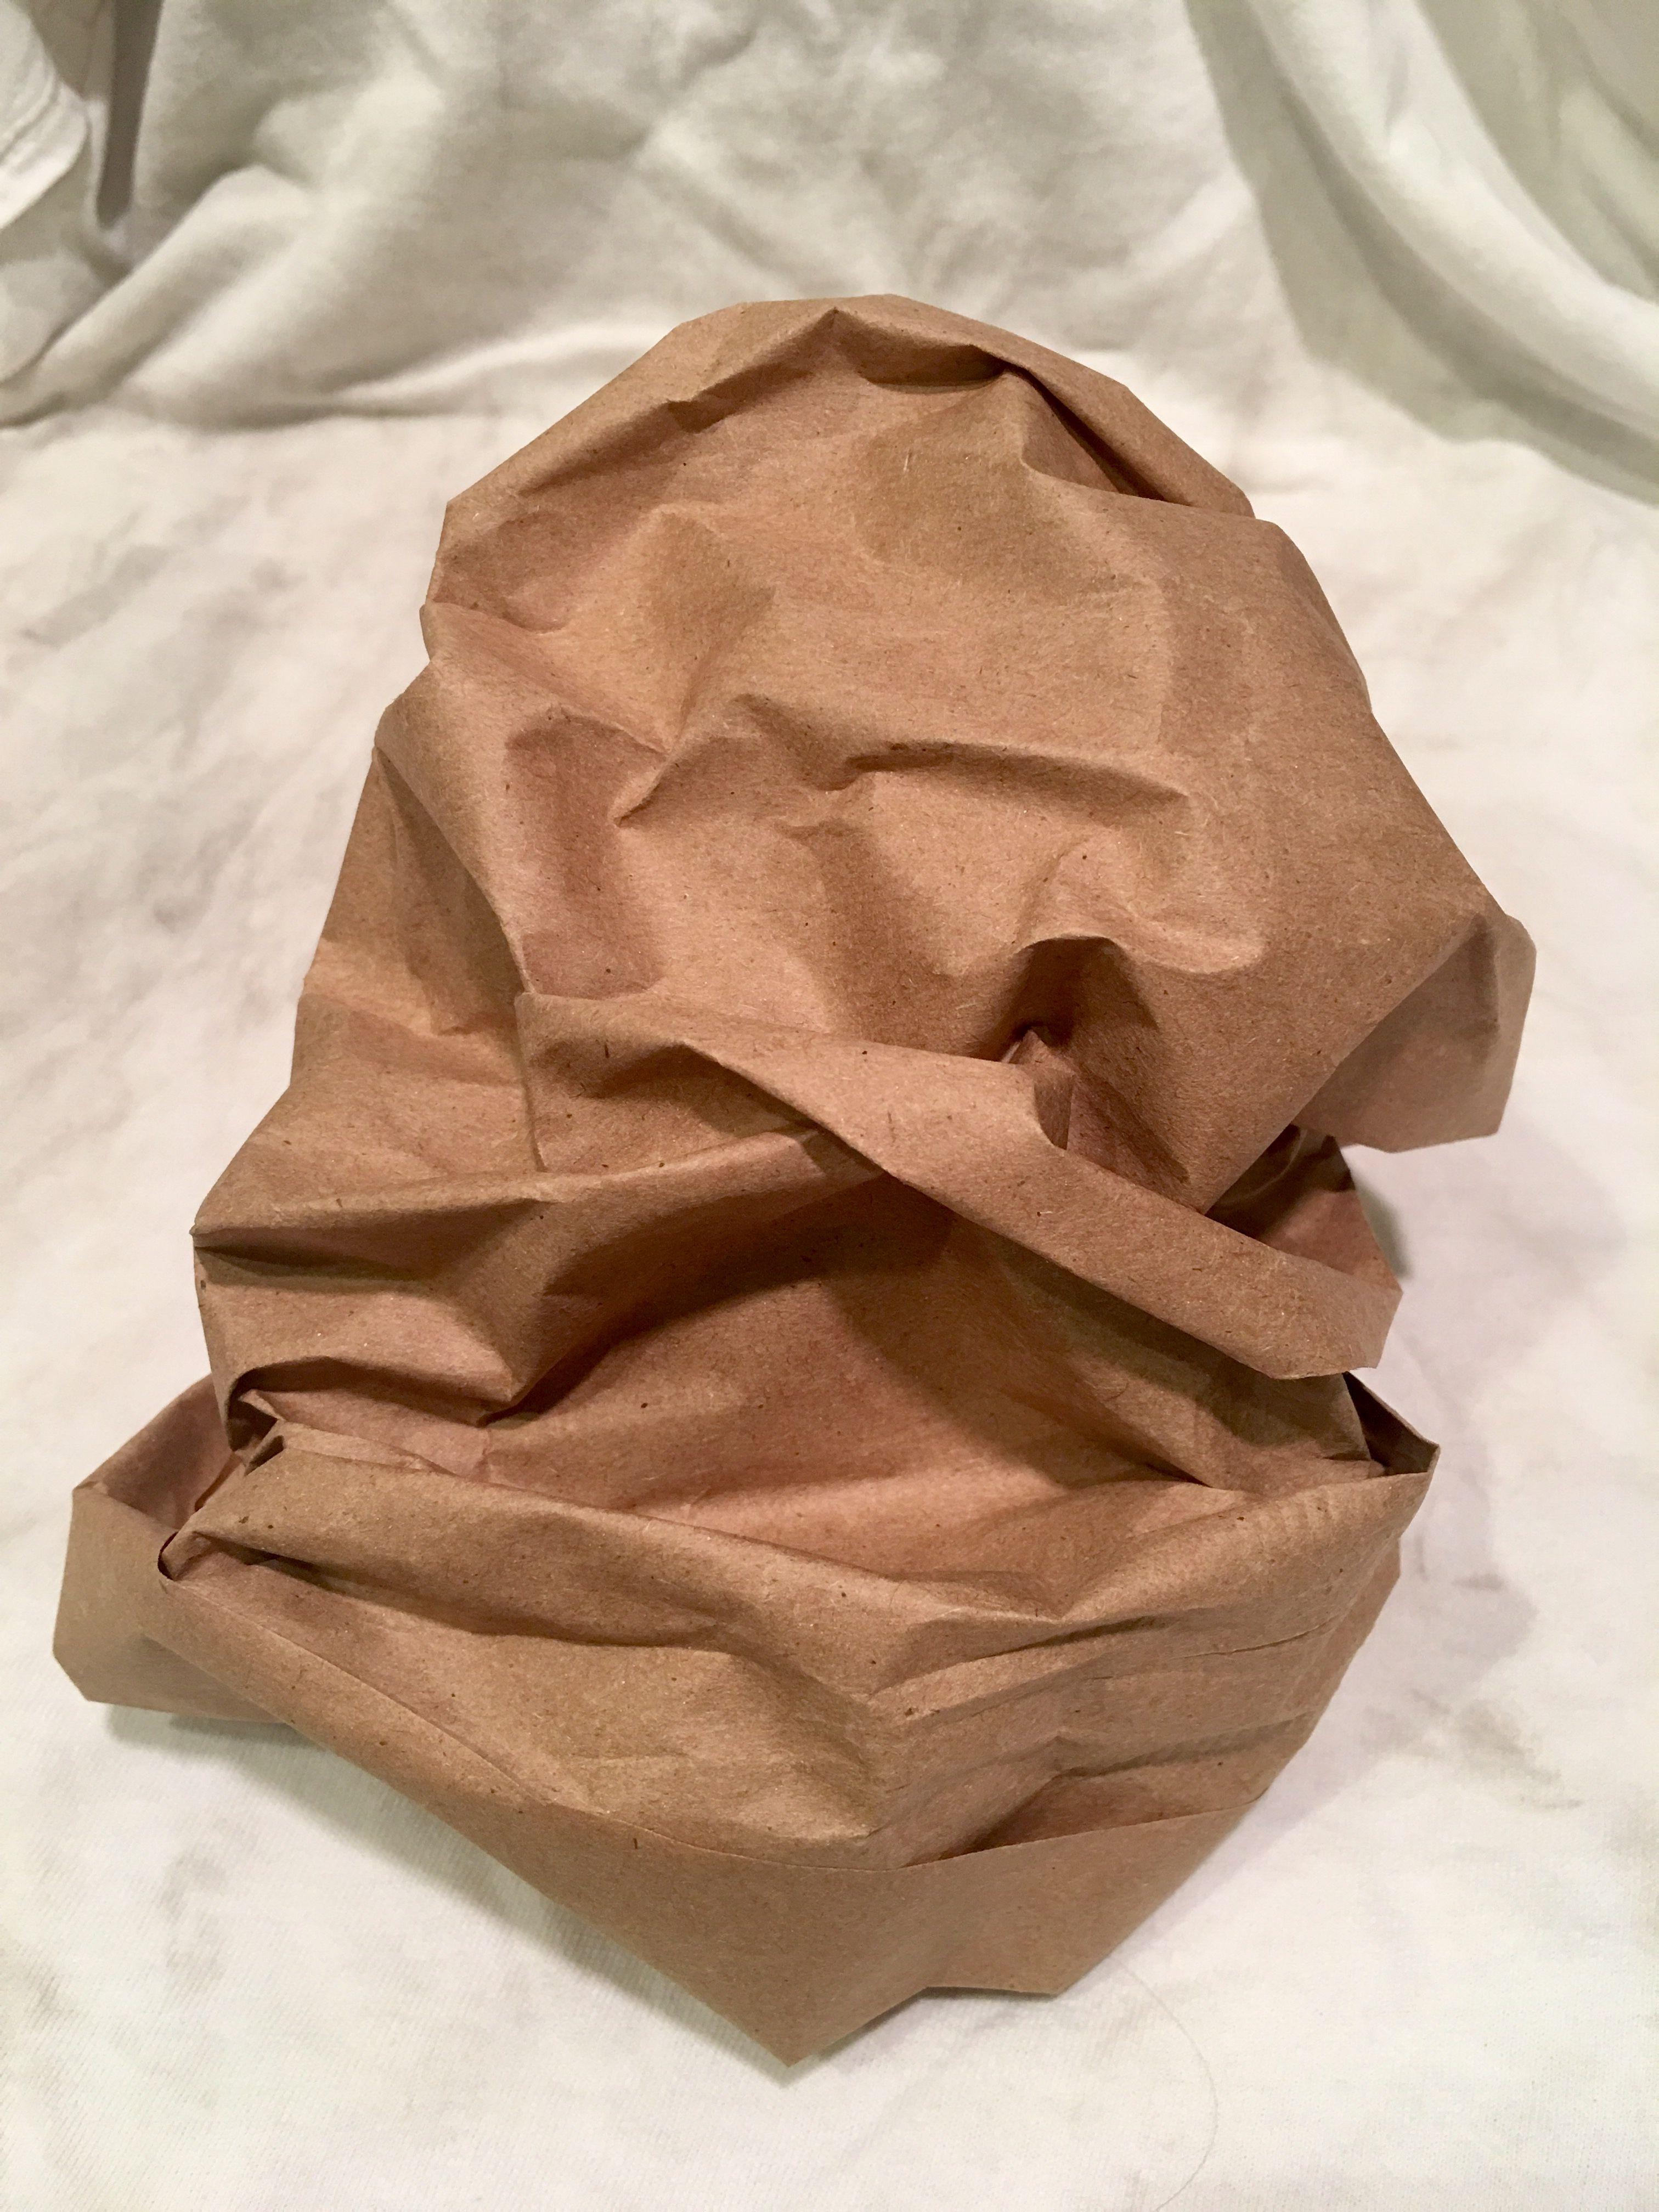 Crumpled Bag 1 Crumple Up A Brown Paper Bag Then Draw It Brown Paper Bag Brown Paper Pattern Design